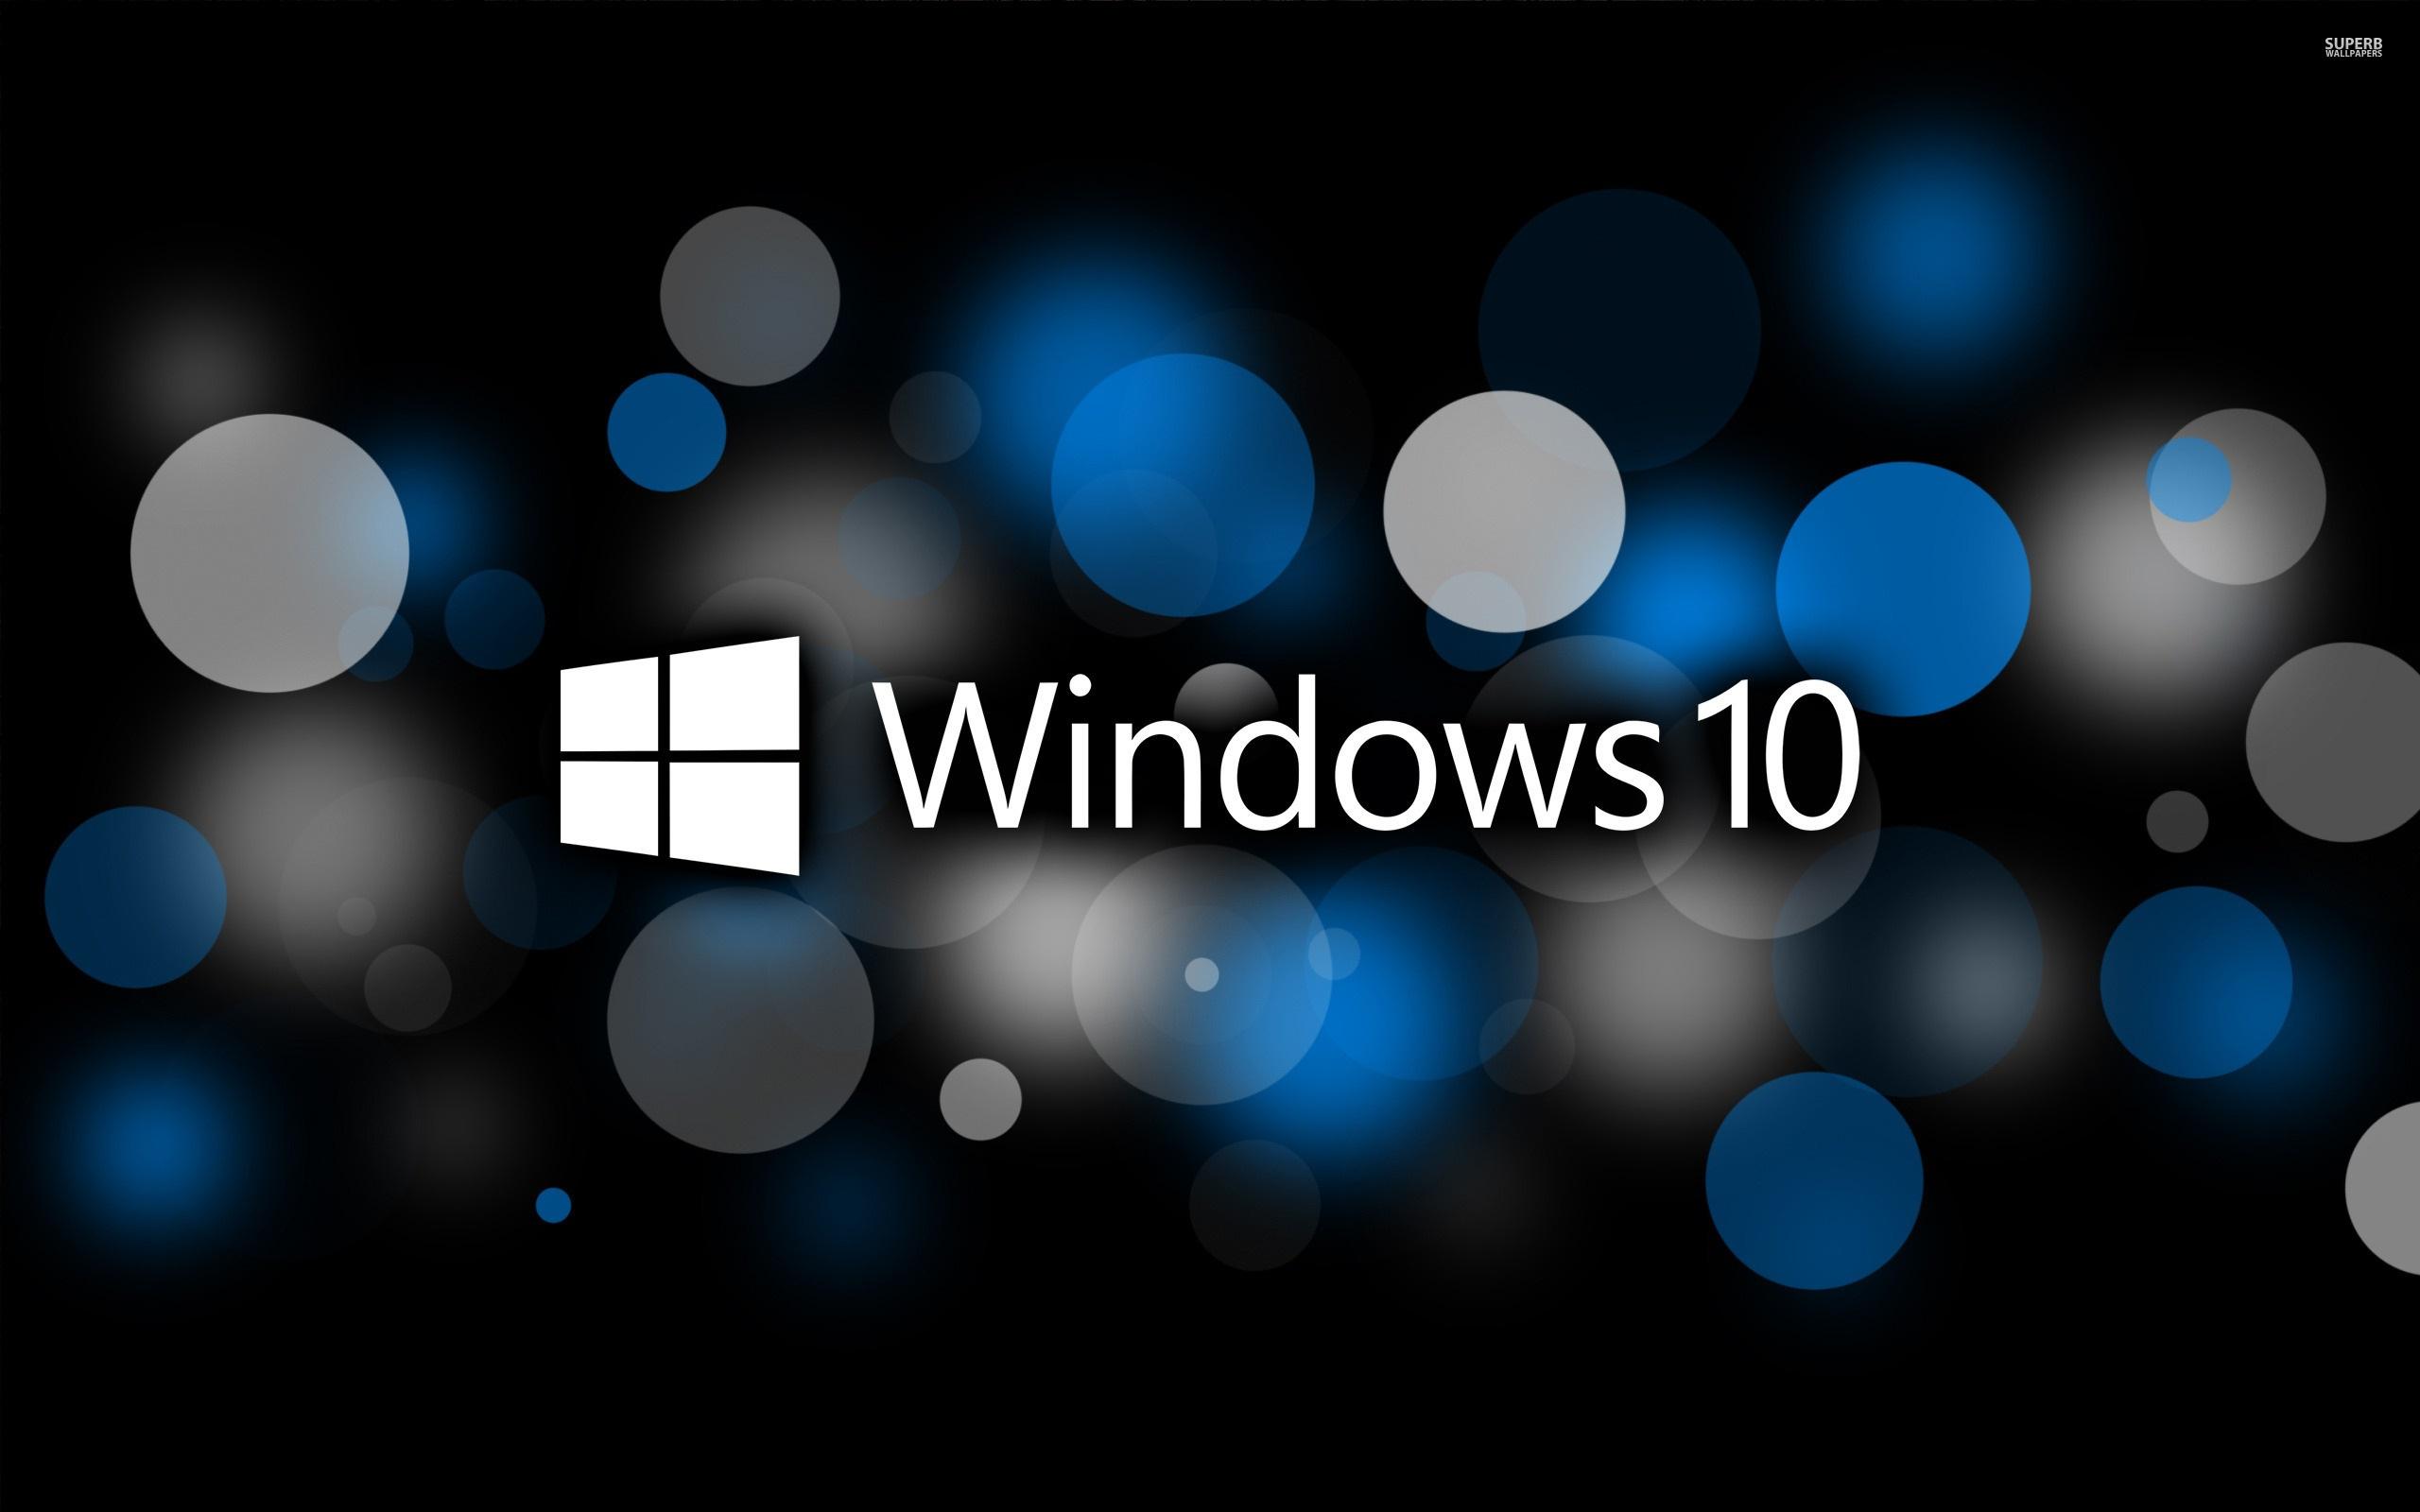 Fondo de escritorio windows 10 hd